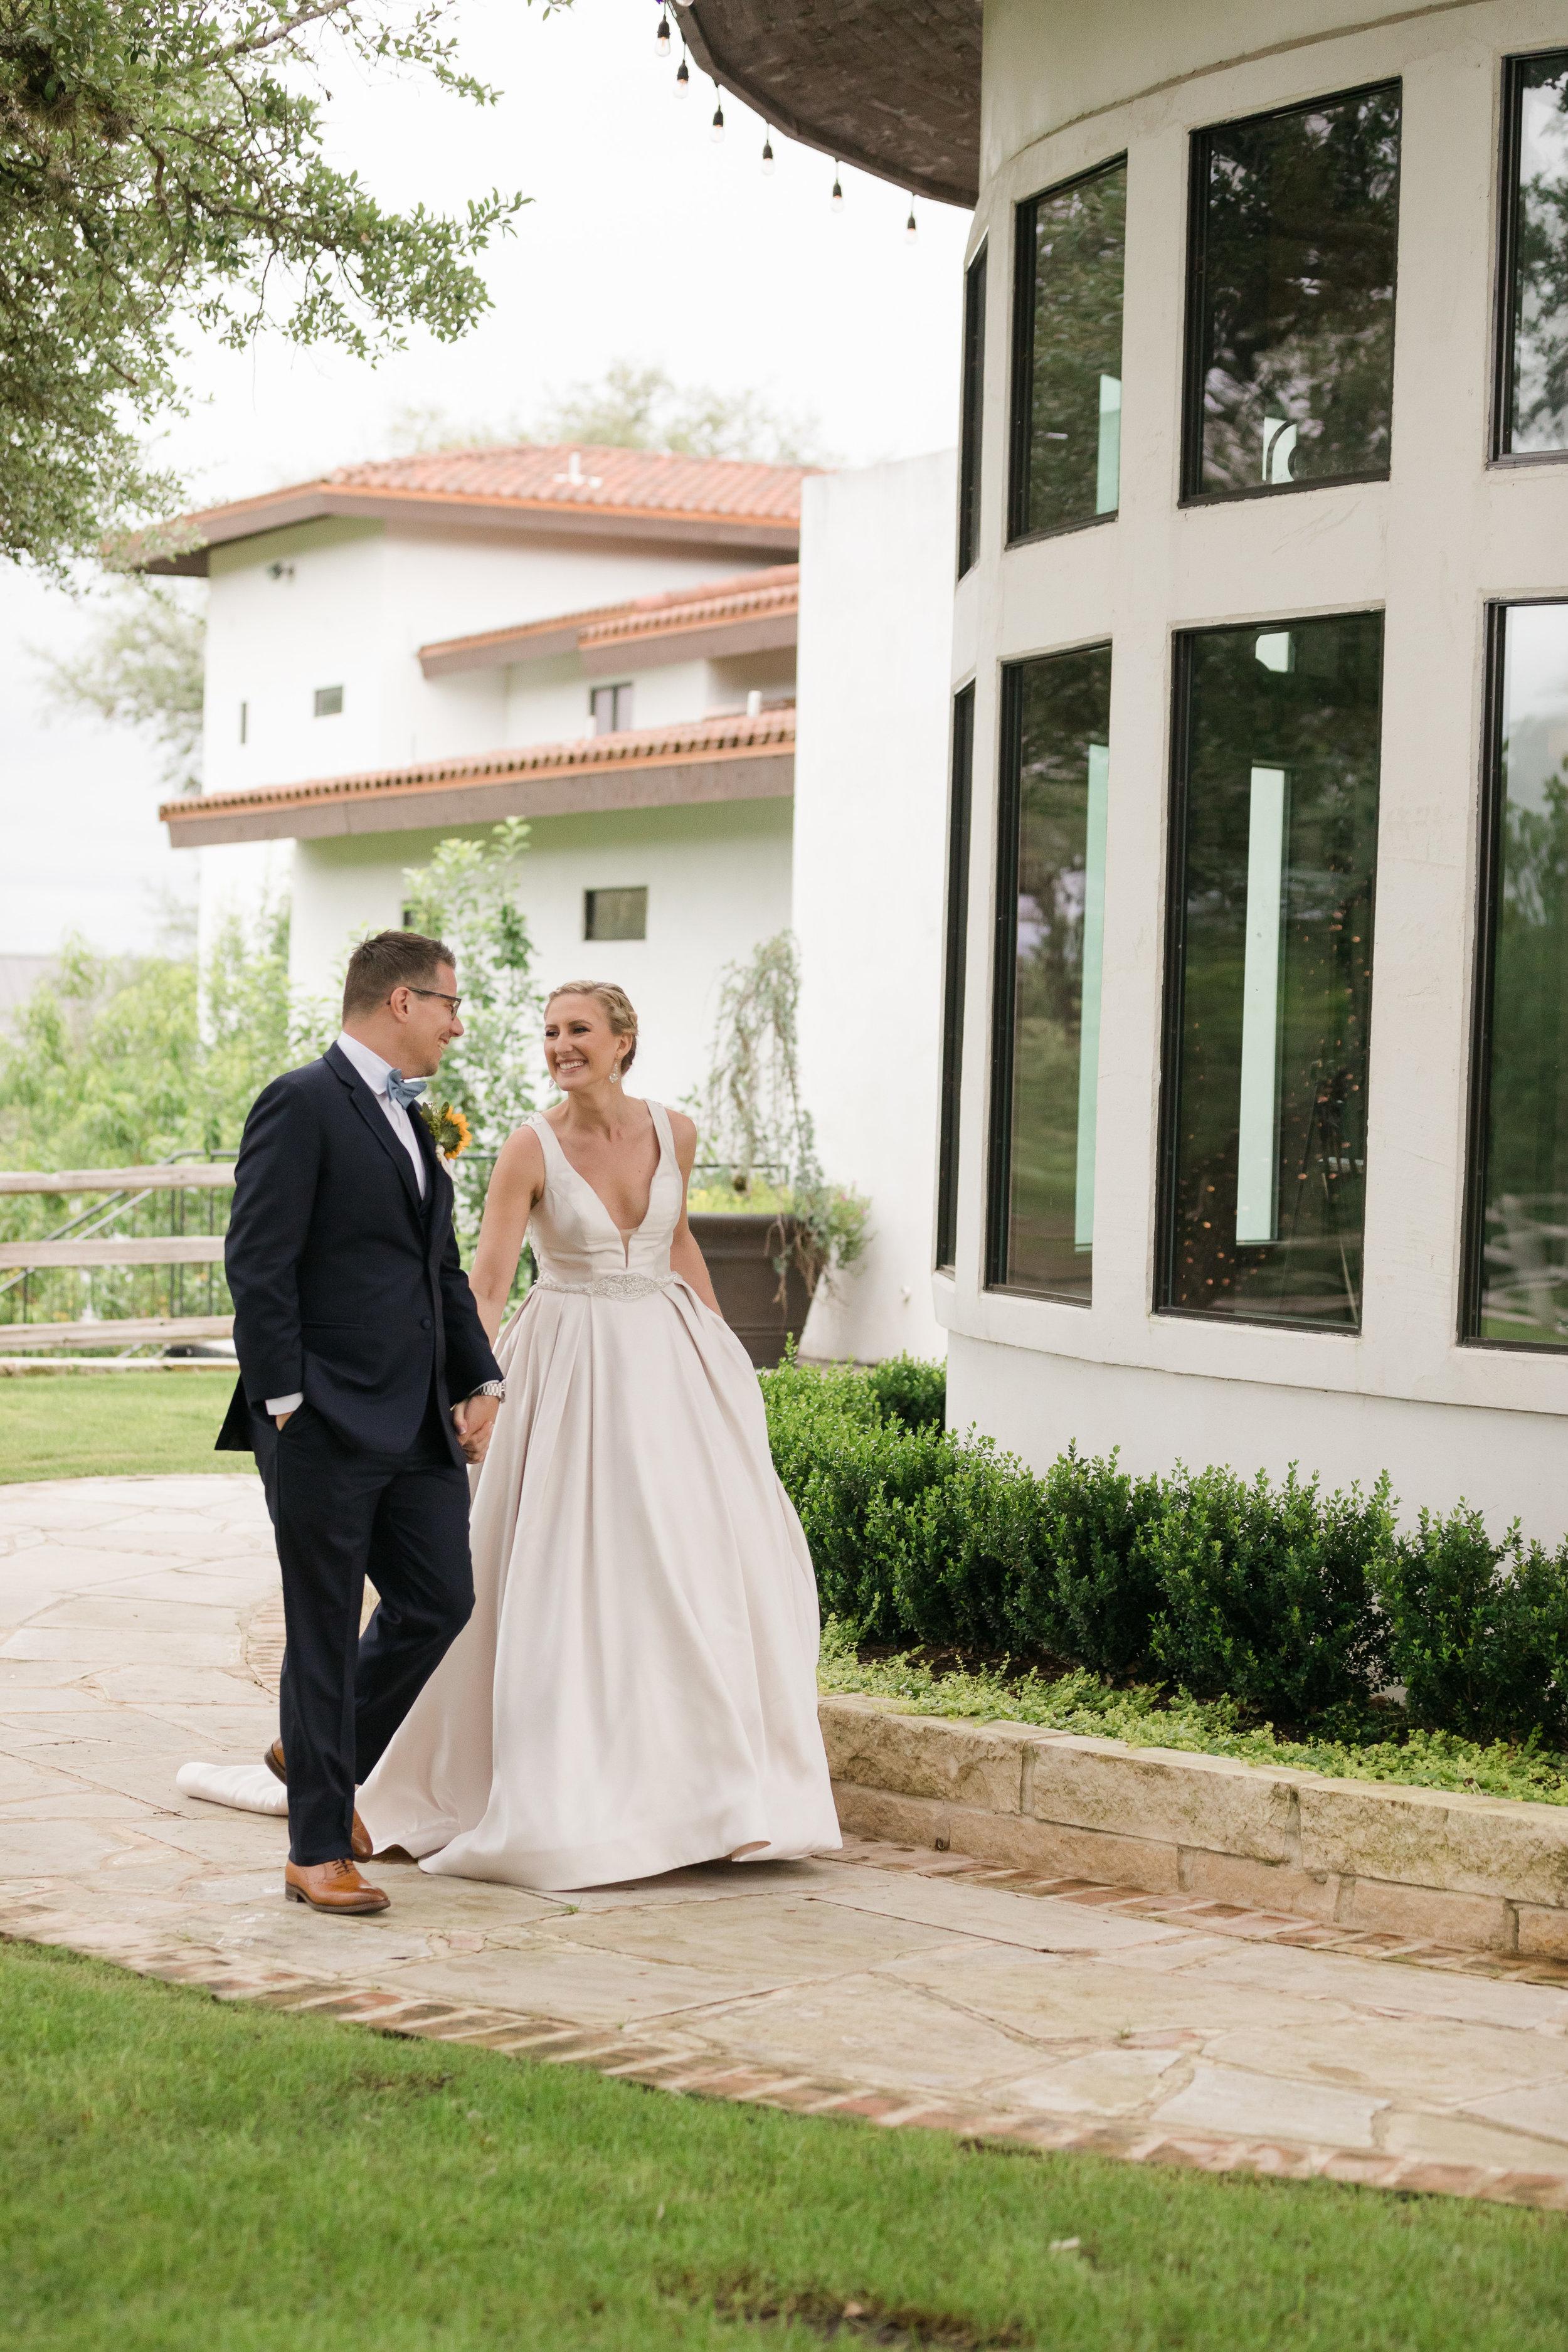 Laufs-Wedding-244.jpg